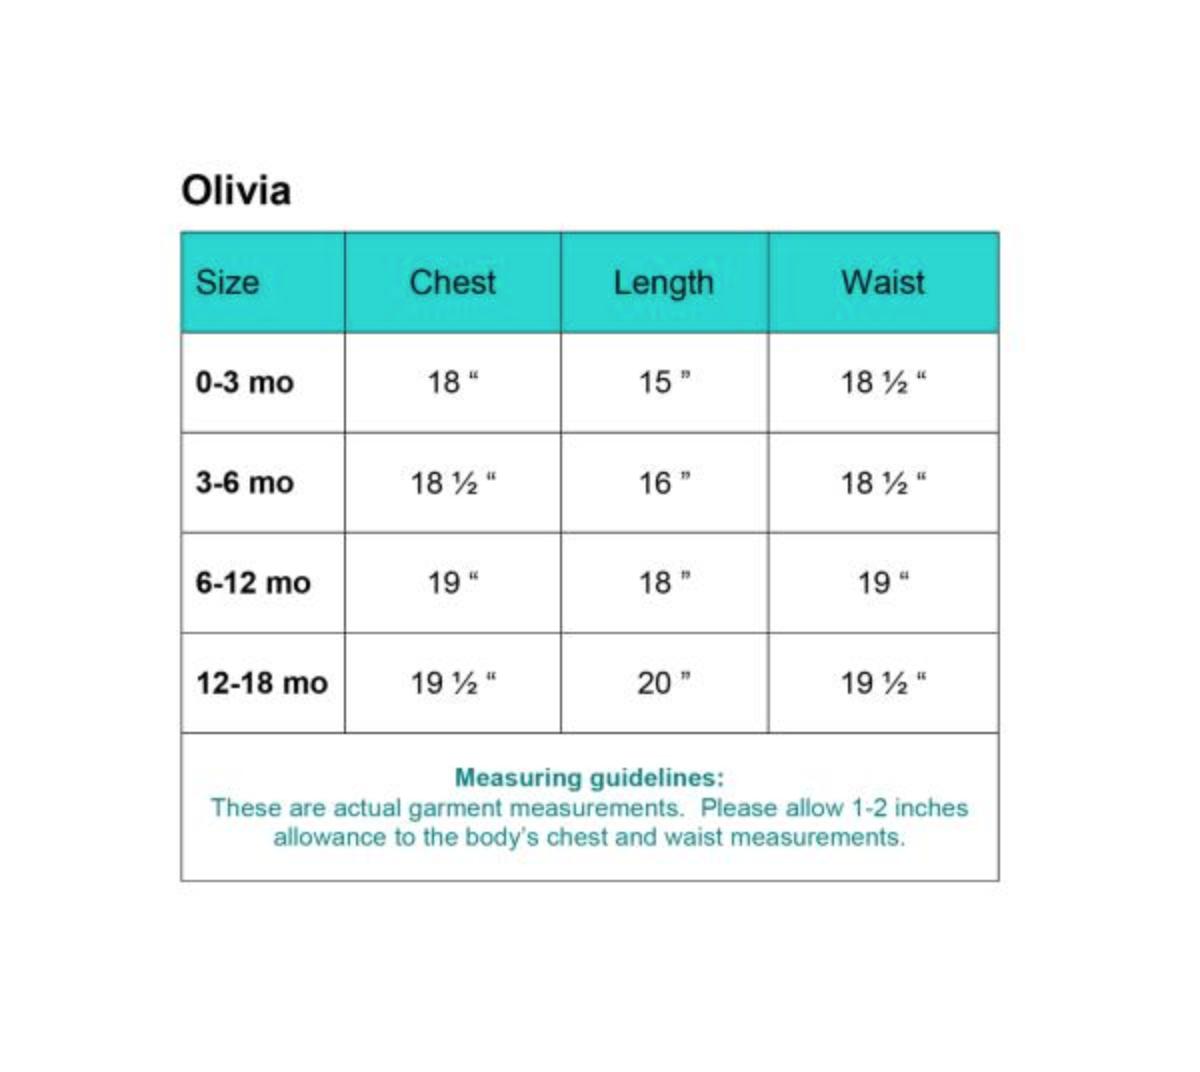 sizing-chart-olivia.png